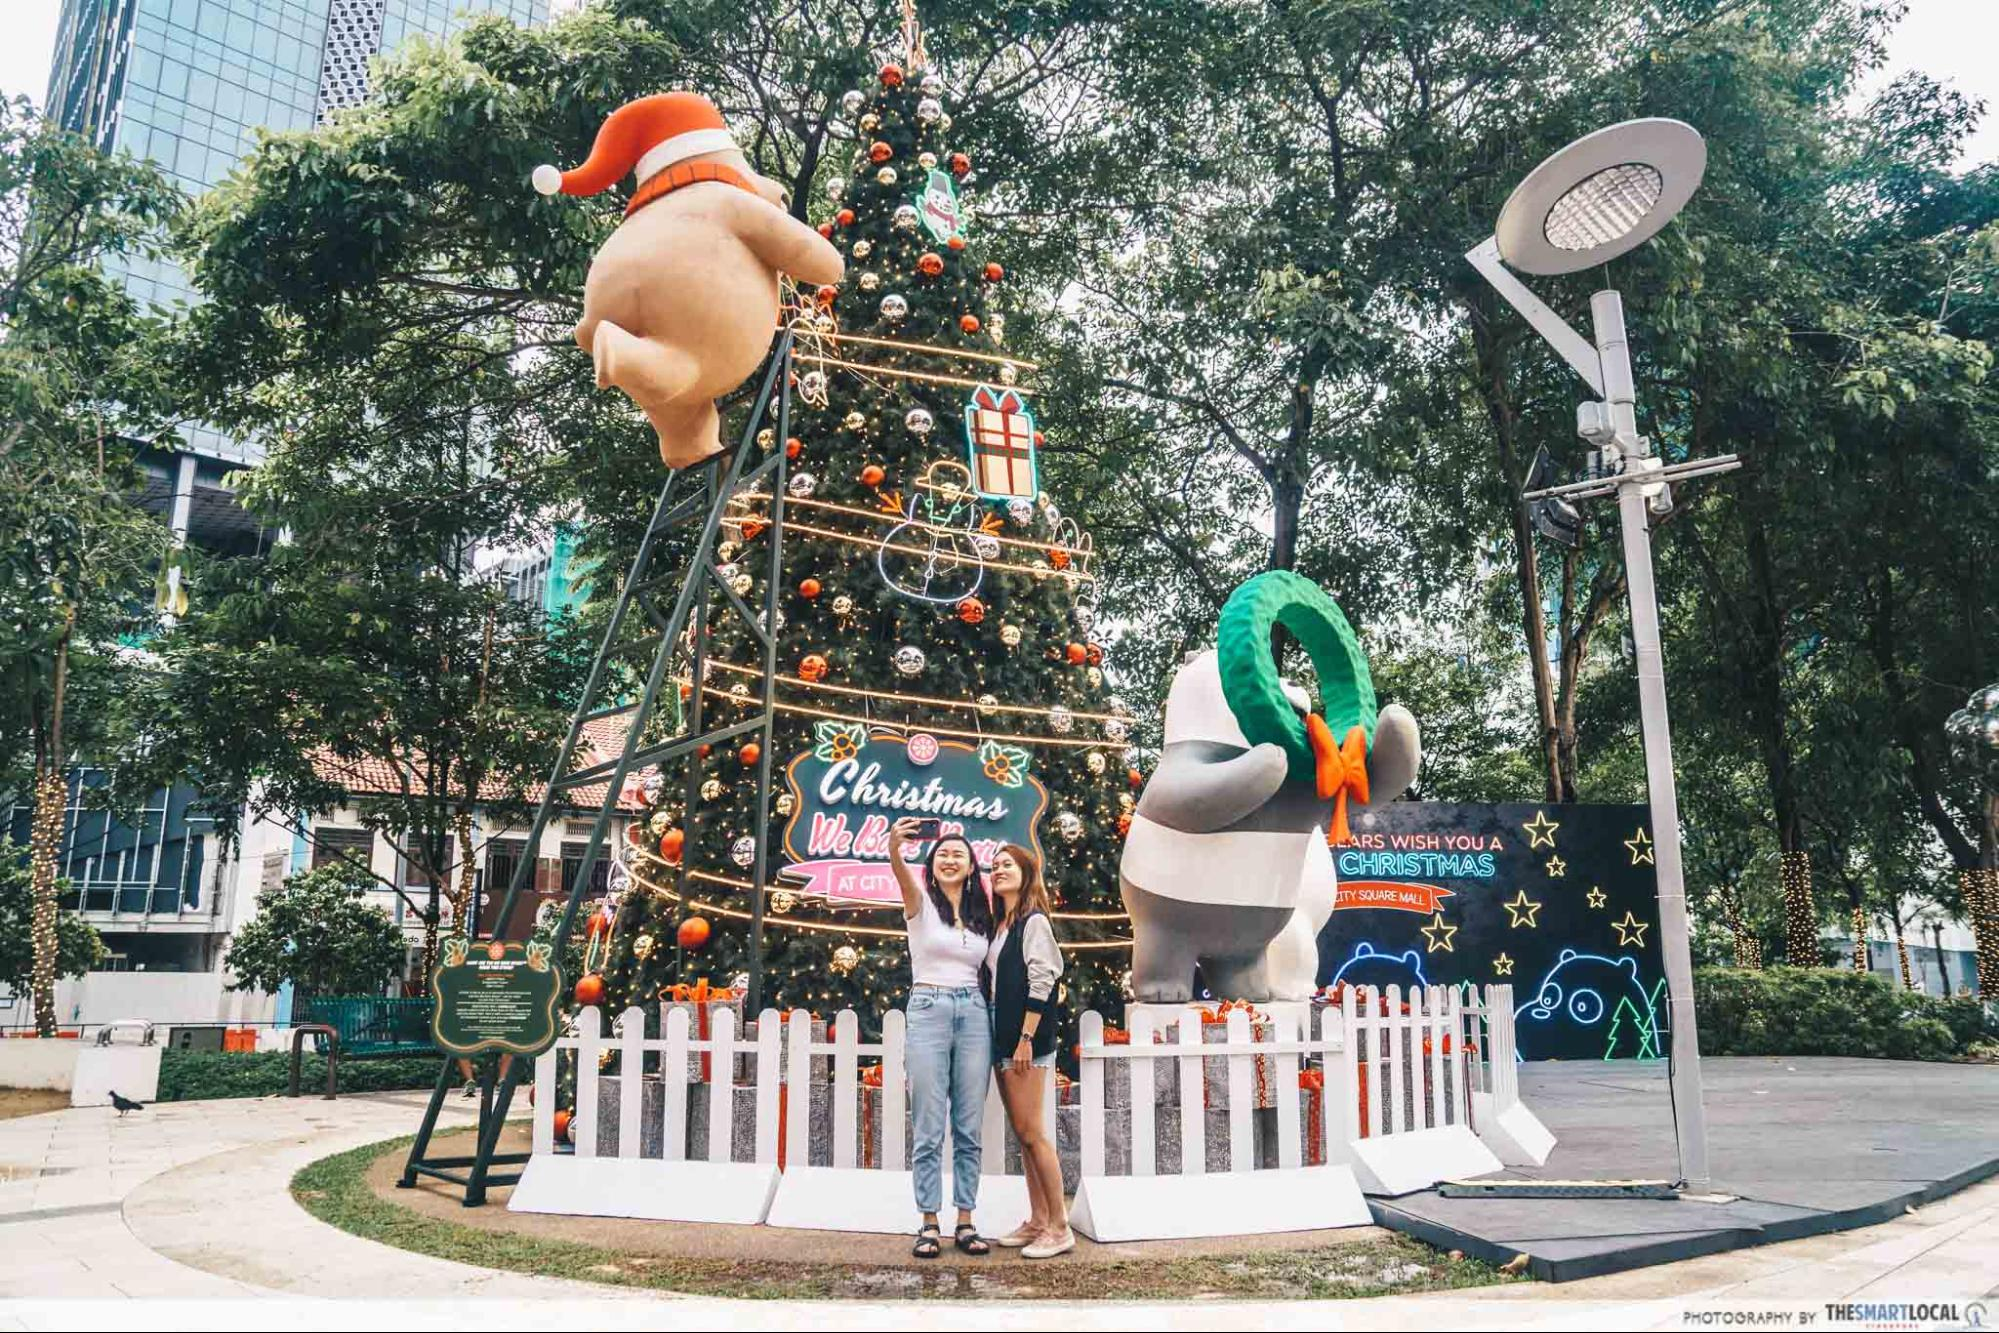 City Square Mall 2019 We Bare Bears Giant Christmas Tree